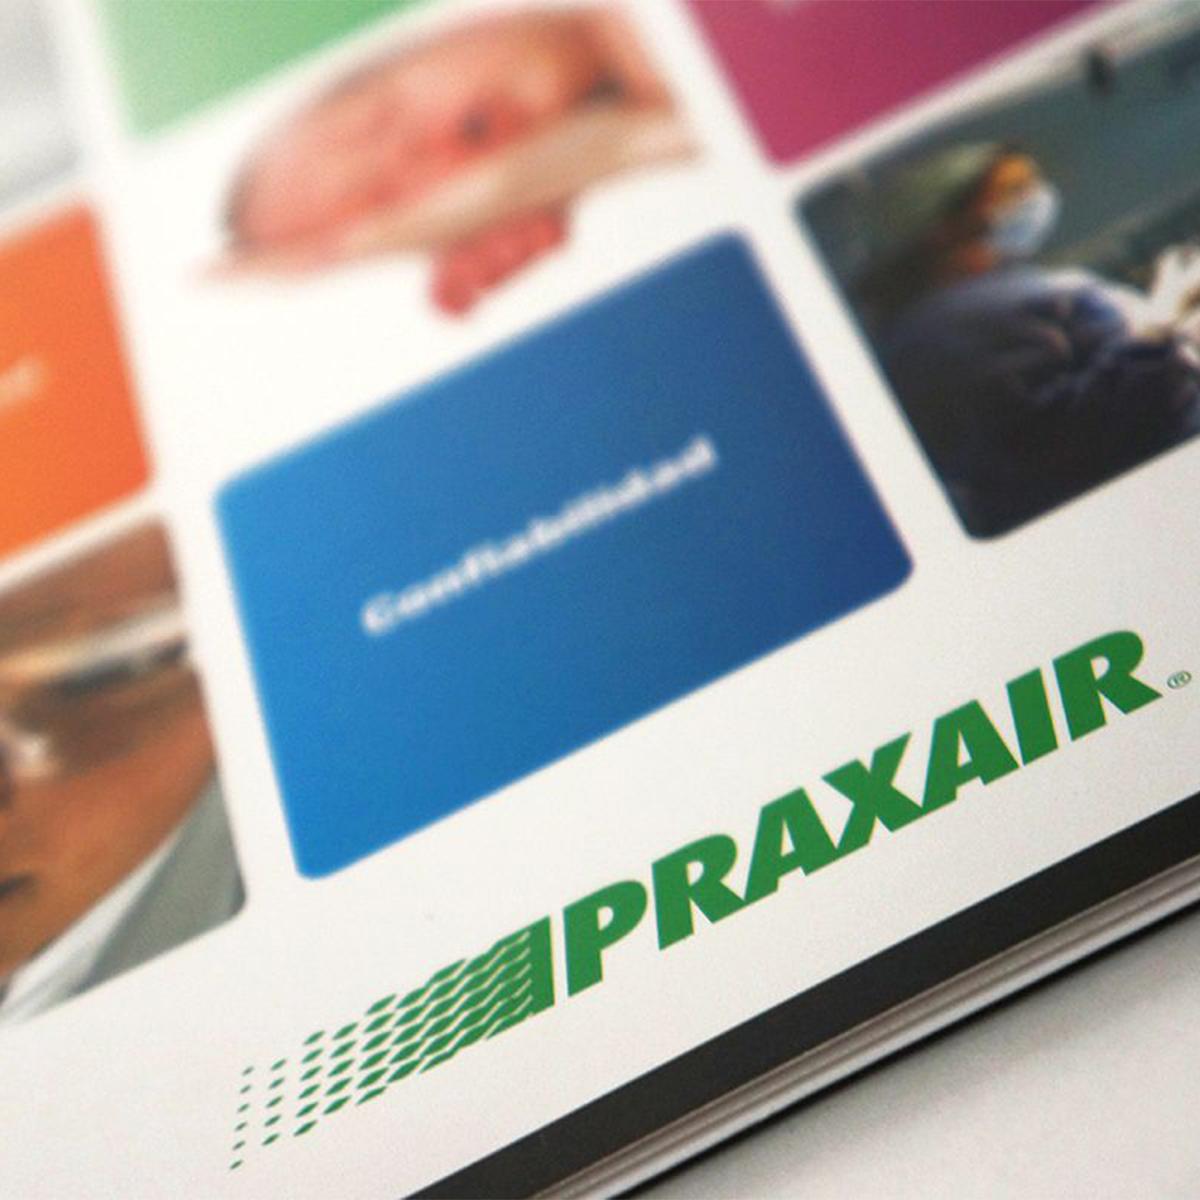 Praxair / Argentina / Folletos Medicinales